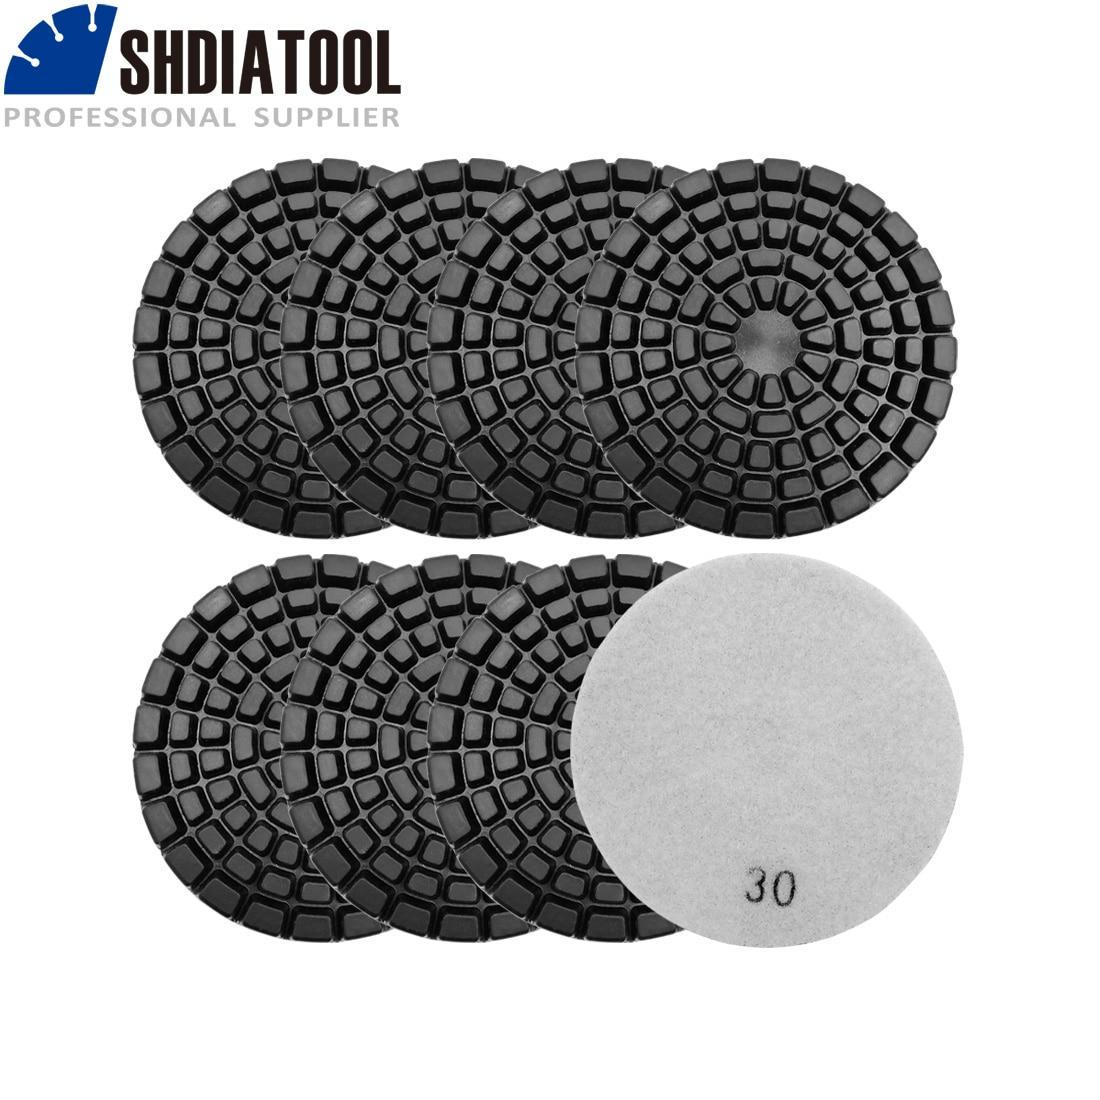 SHDIATOOL 8pcs 100mm/4inch Thickened Diamond Resin Bond Concrete Polishing Pads Grit #30 Concrete Floor Renew Sanding Discs